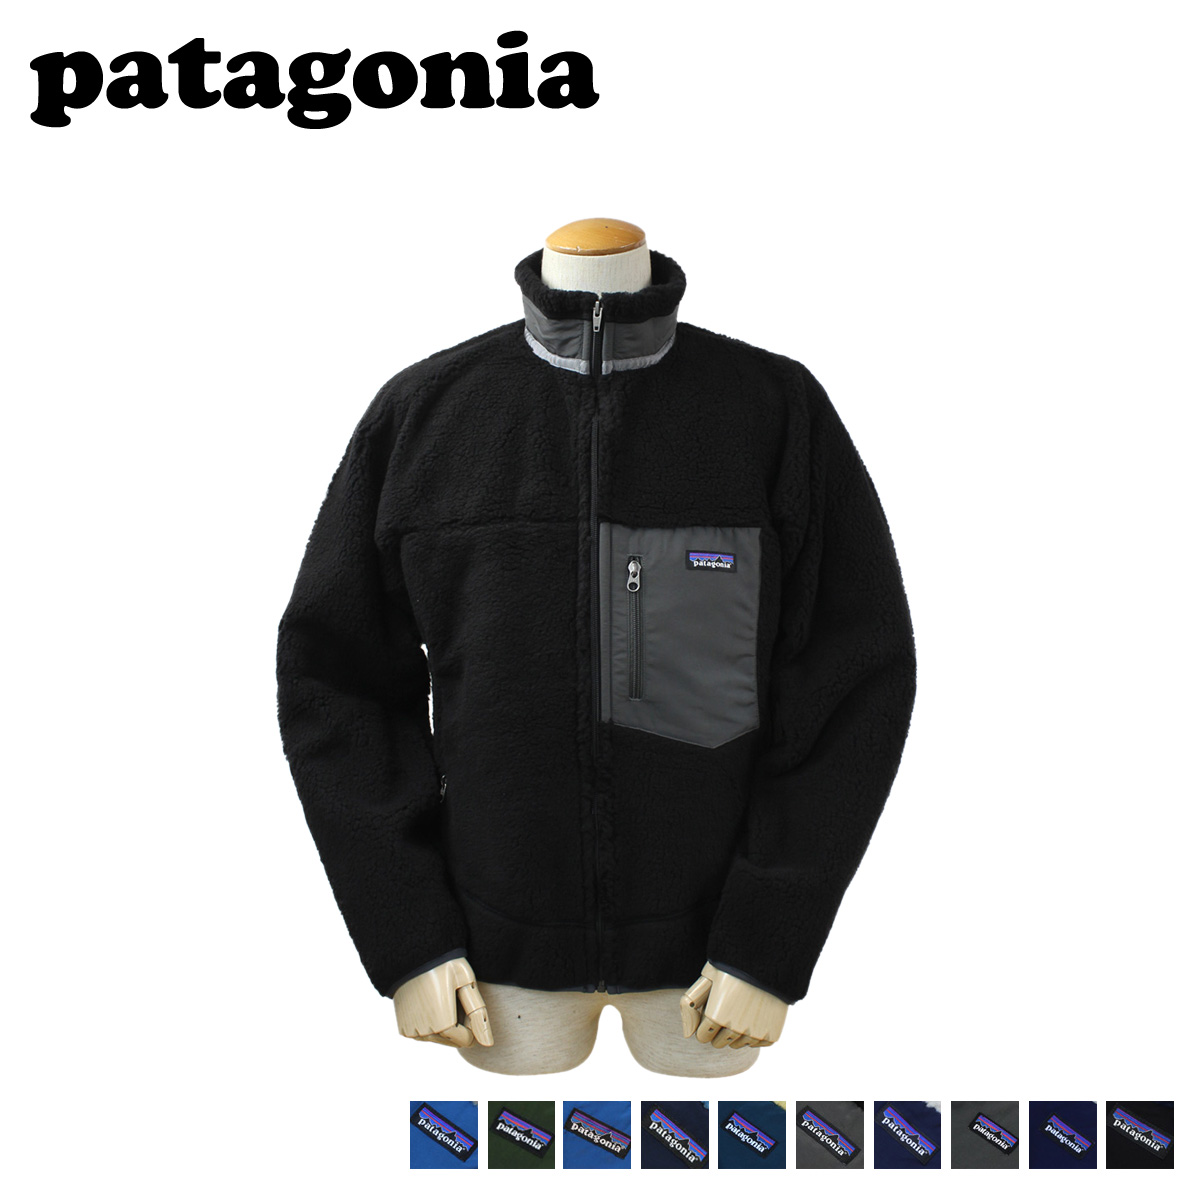 patagonia Patagonia fleece jacket boa jacket CLASSIC RETRO-X JACKET 23055  men